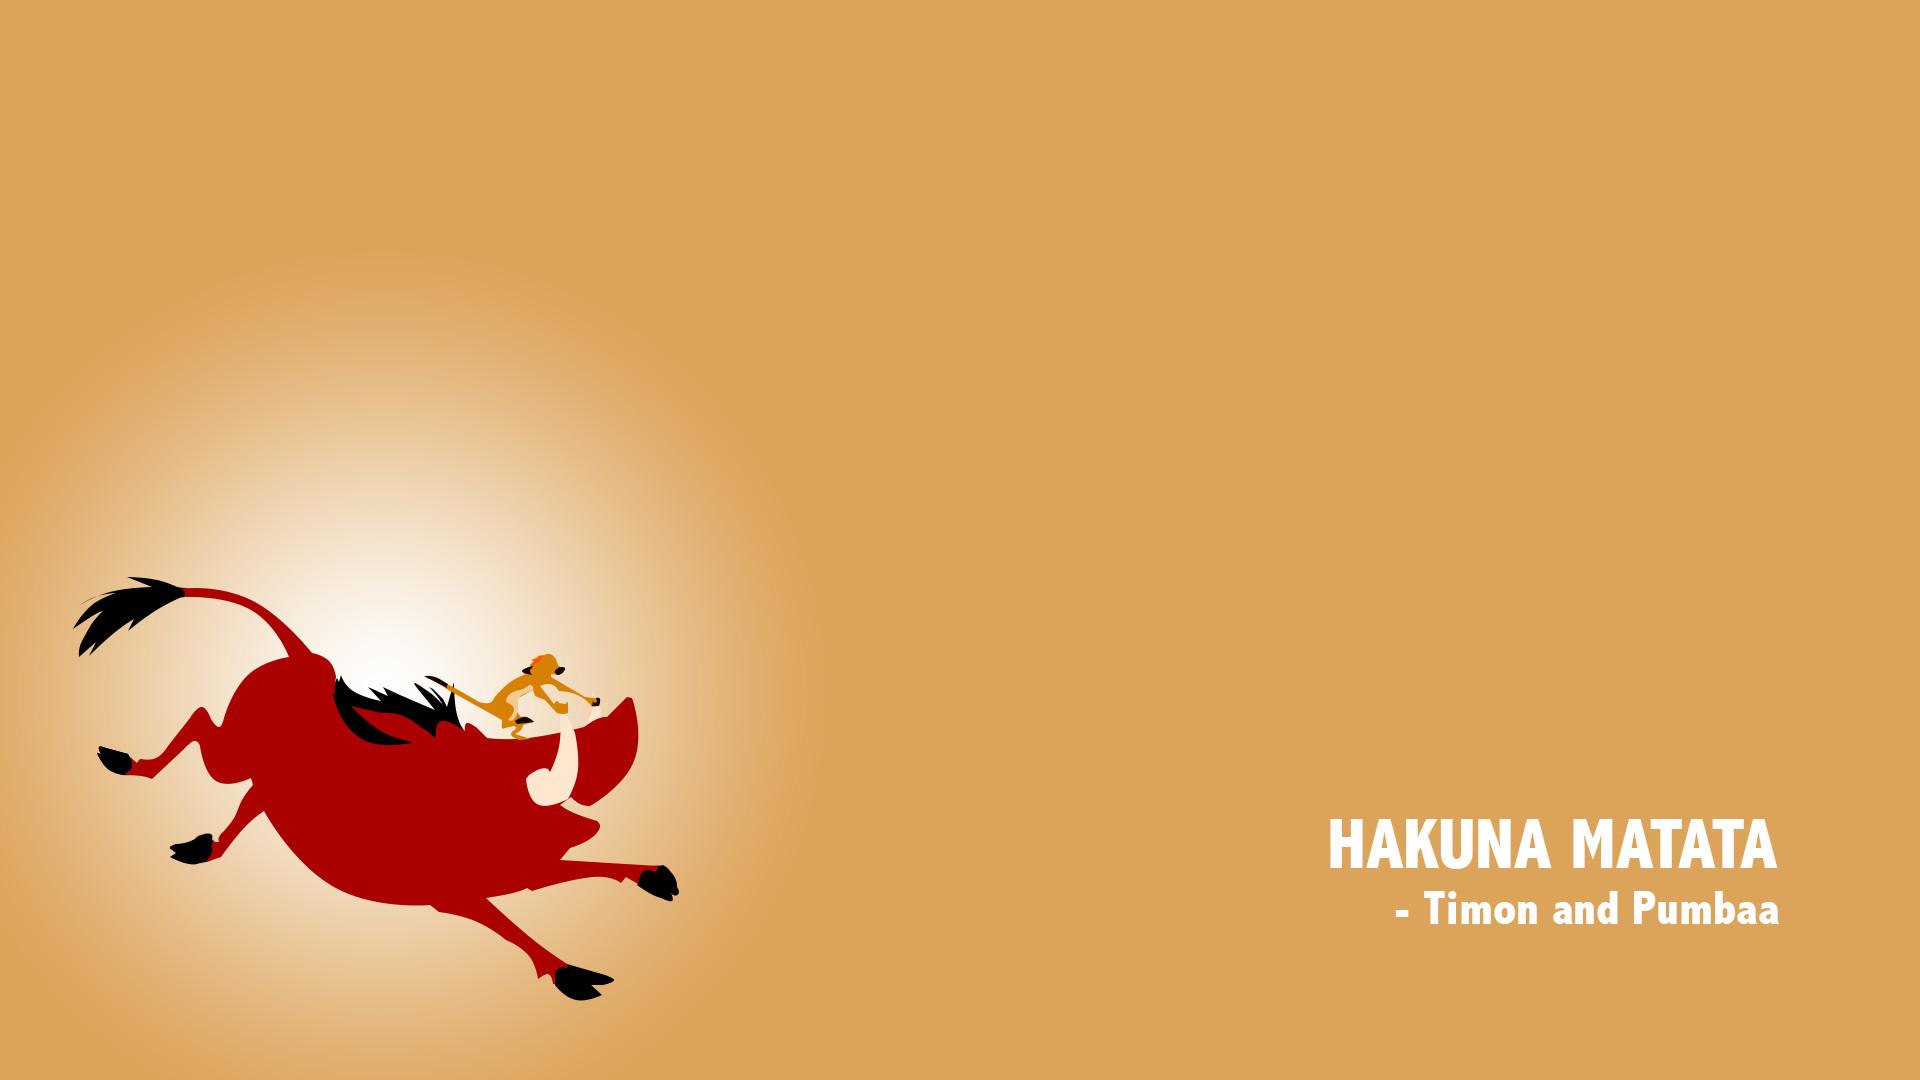 Hakuna Matata Wallpaper ·①